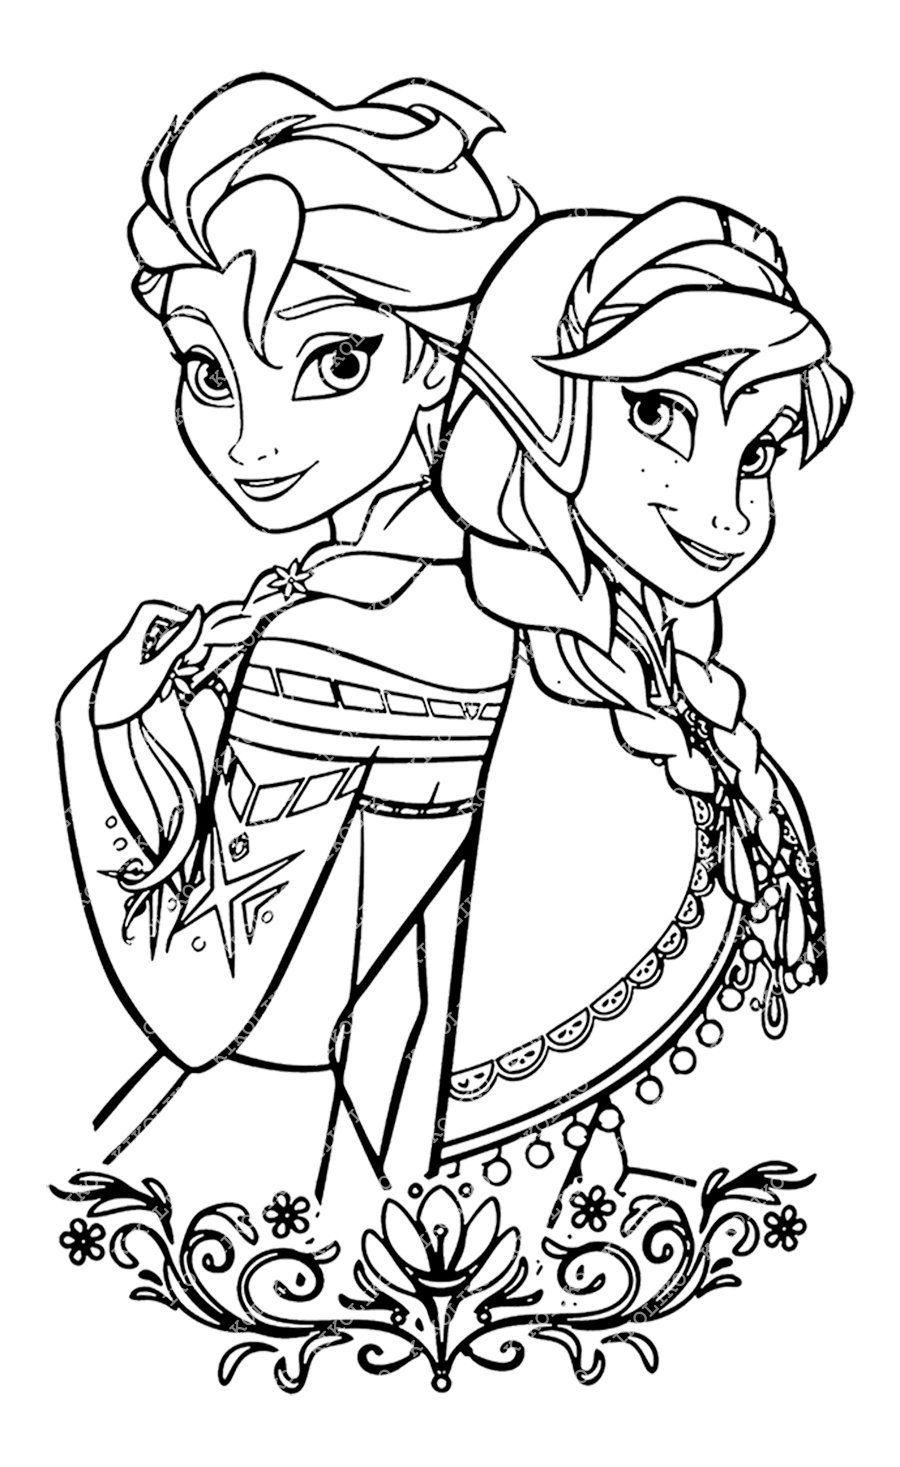 Elsa and Anna Svg Files Disney Princess Elsa and Anna